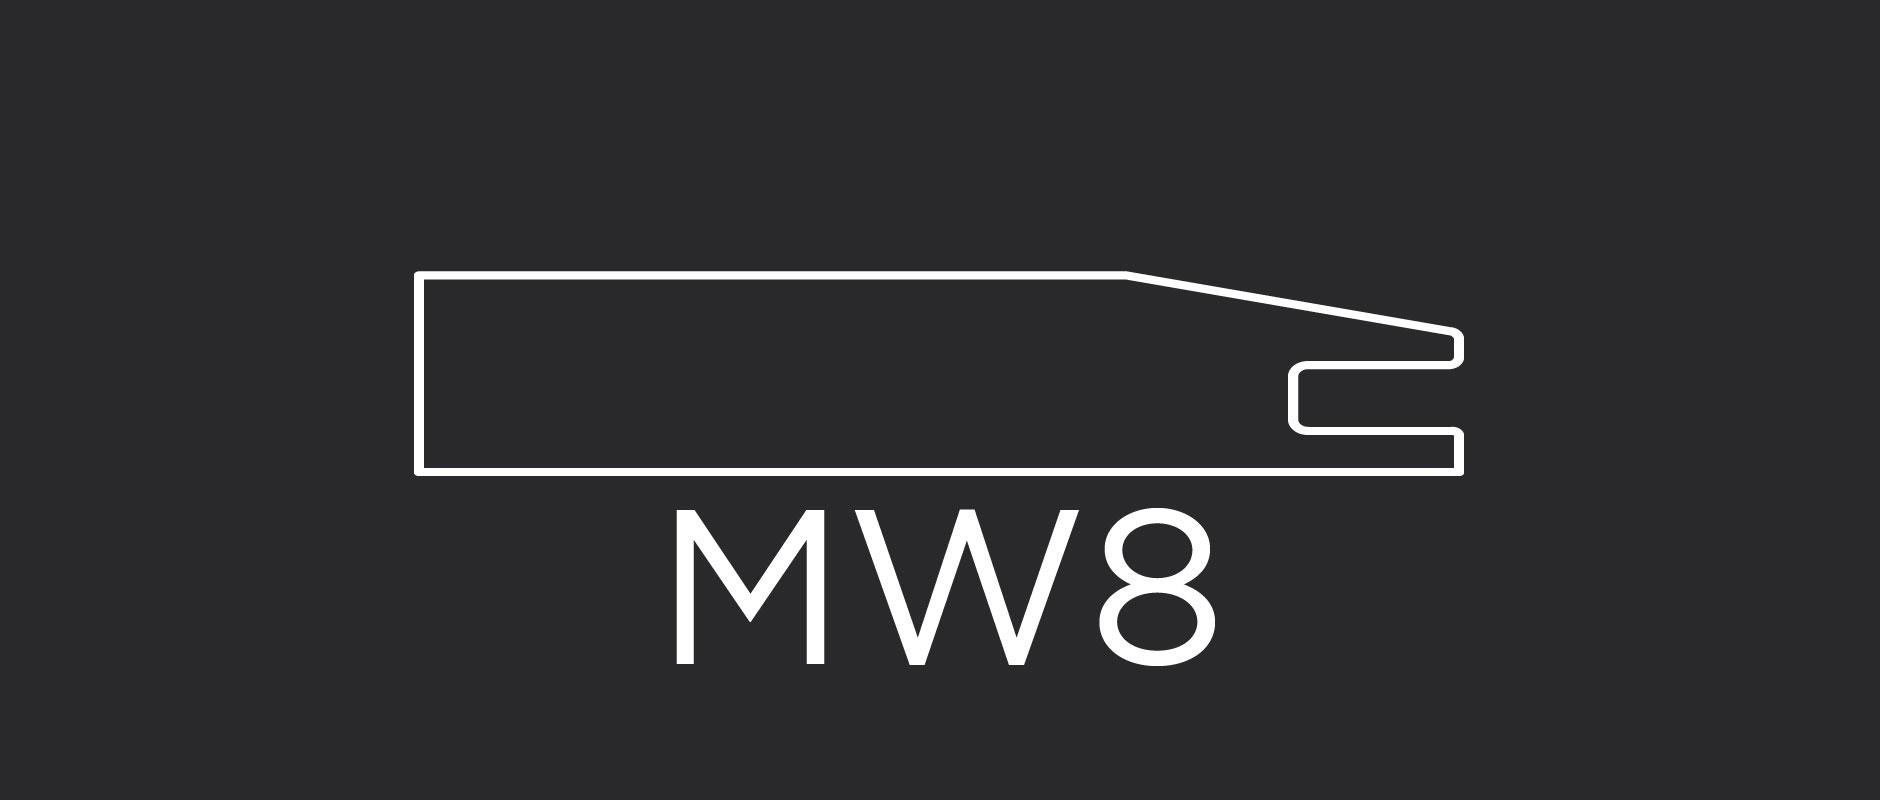 "MW8 mitered cabinet door frame 3-1/8"" wide"